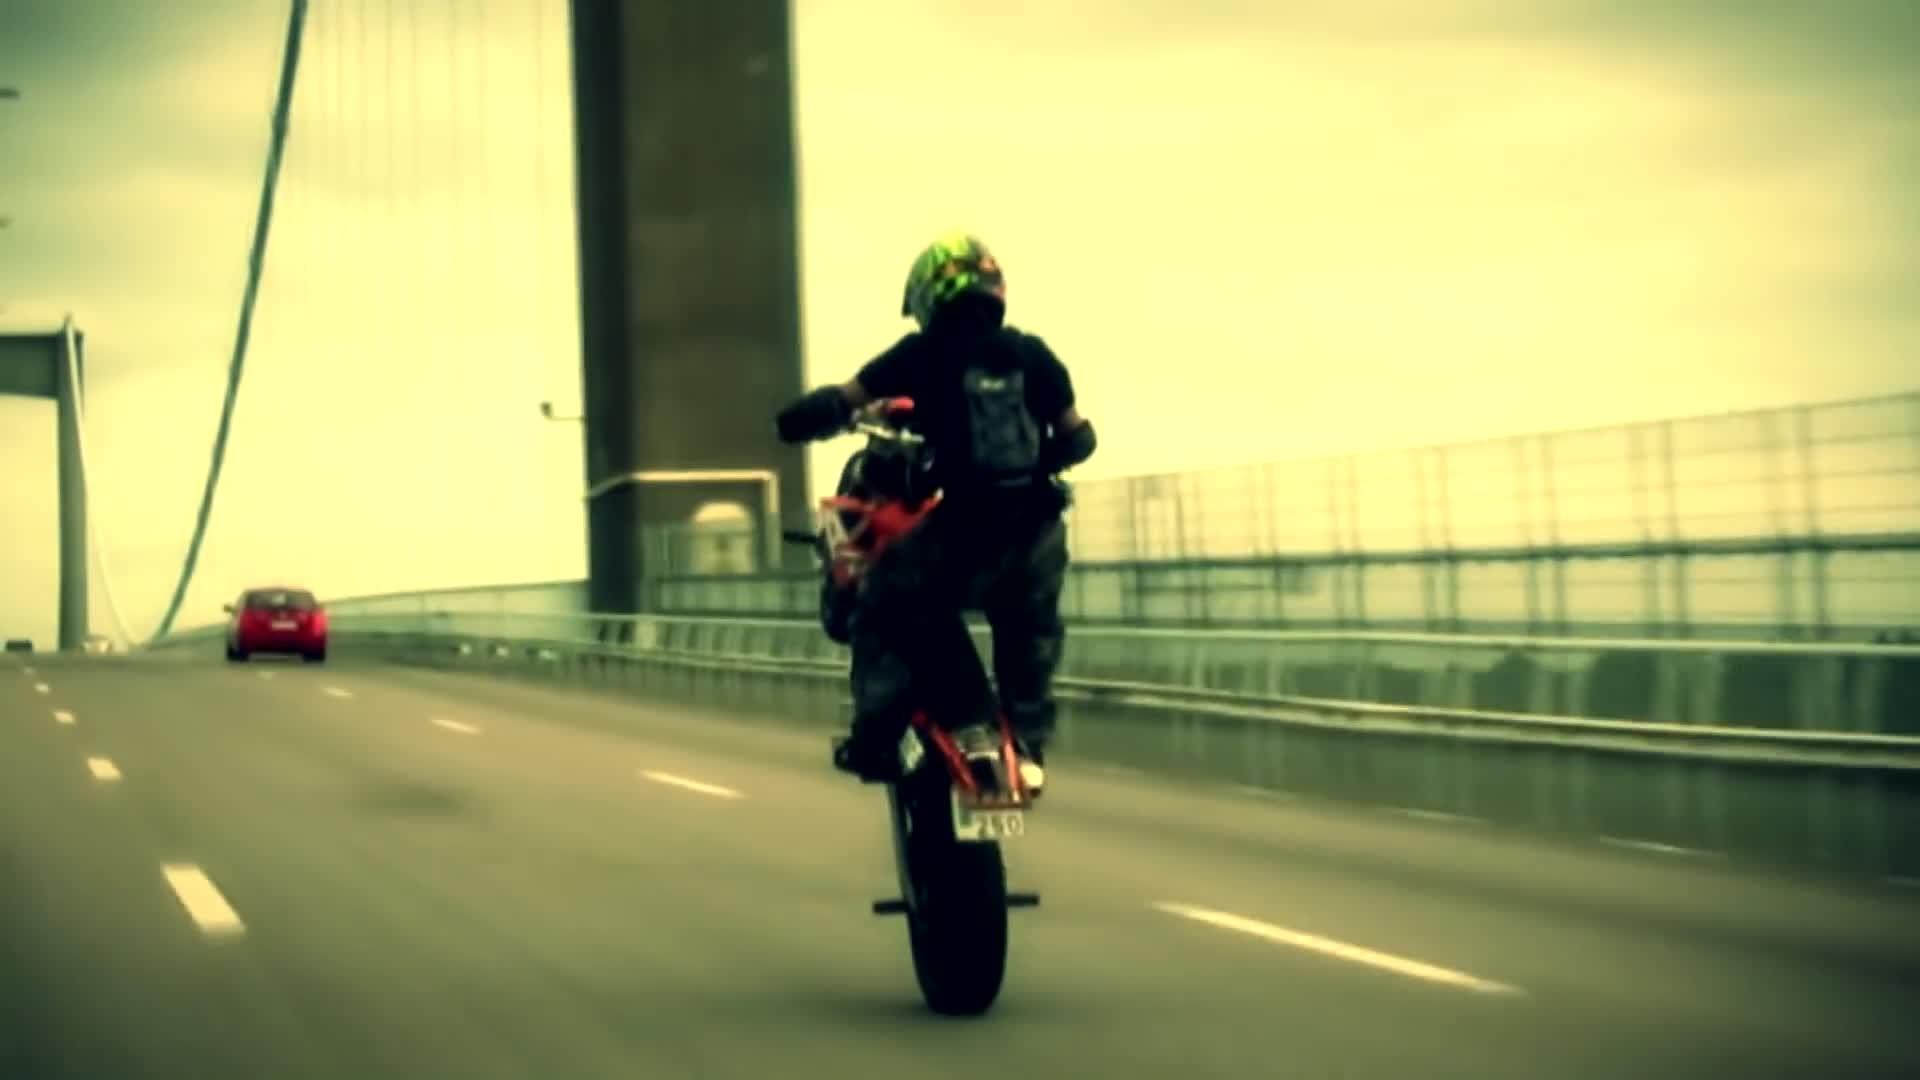 Gbgx3m - Mx Josef 50STUNT VIDEO COMPETITION, ROUND 2 (Josef Götherskjöld) Insane Supermoto stunt-c52zJDXgrs4 GIFs